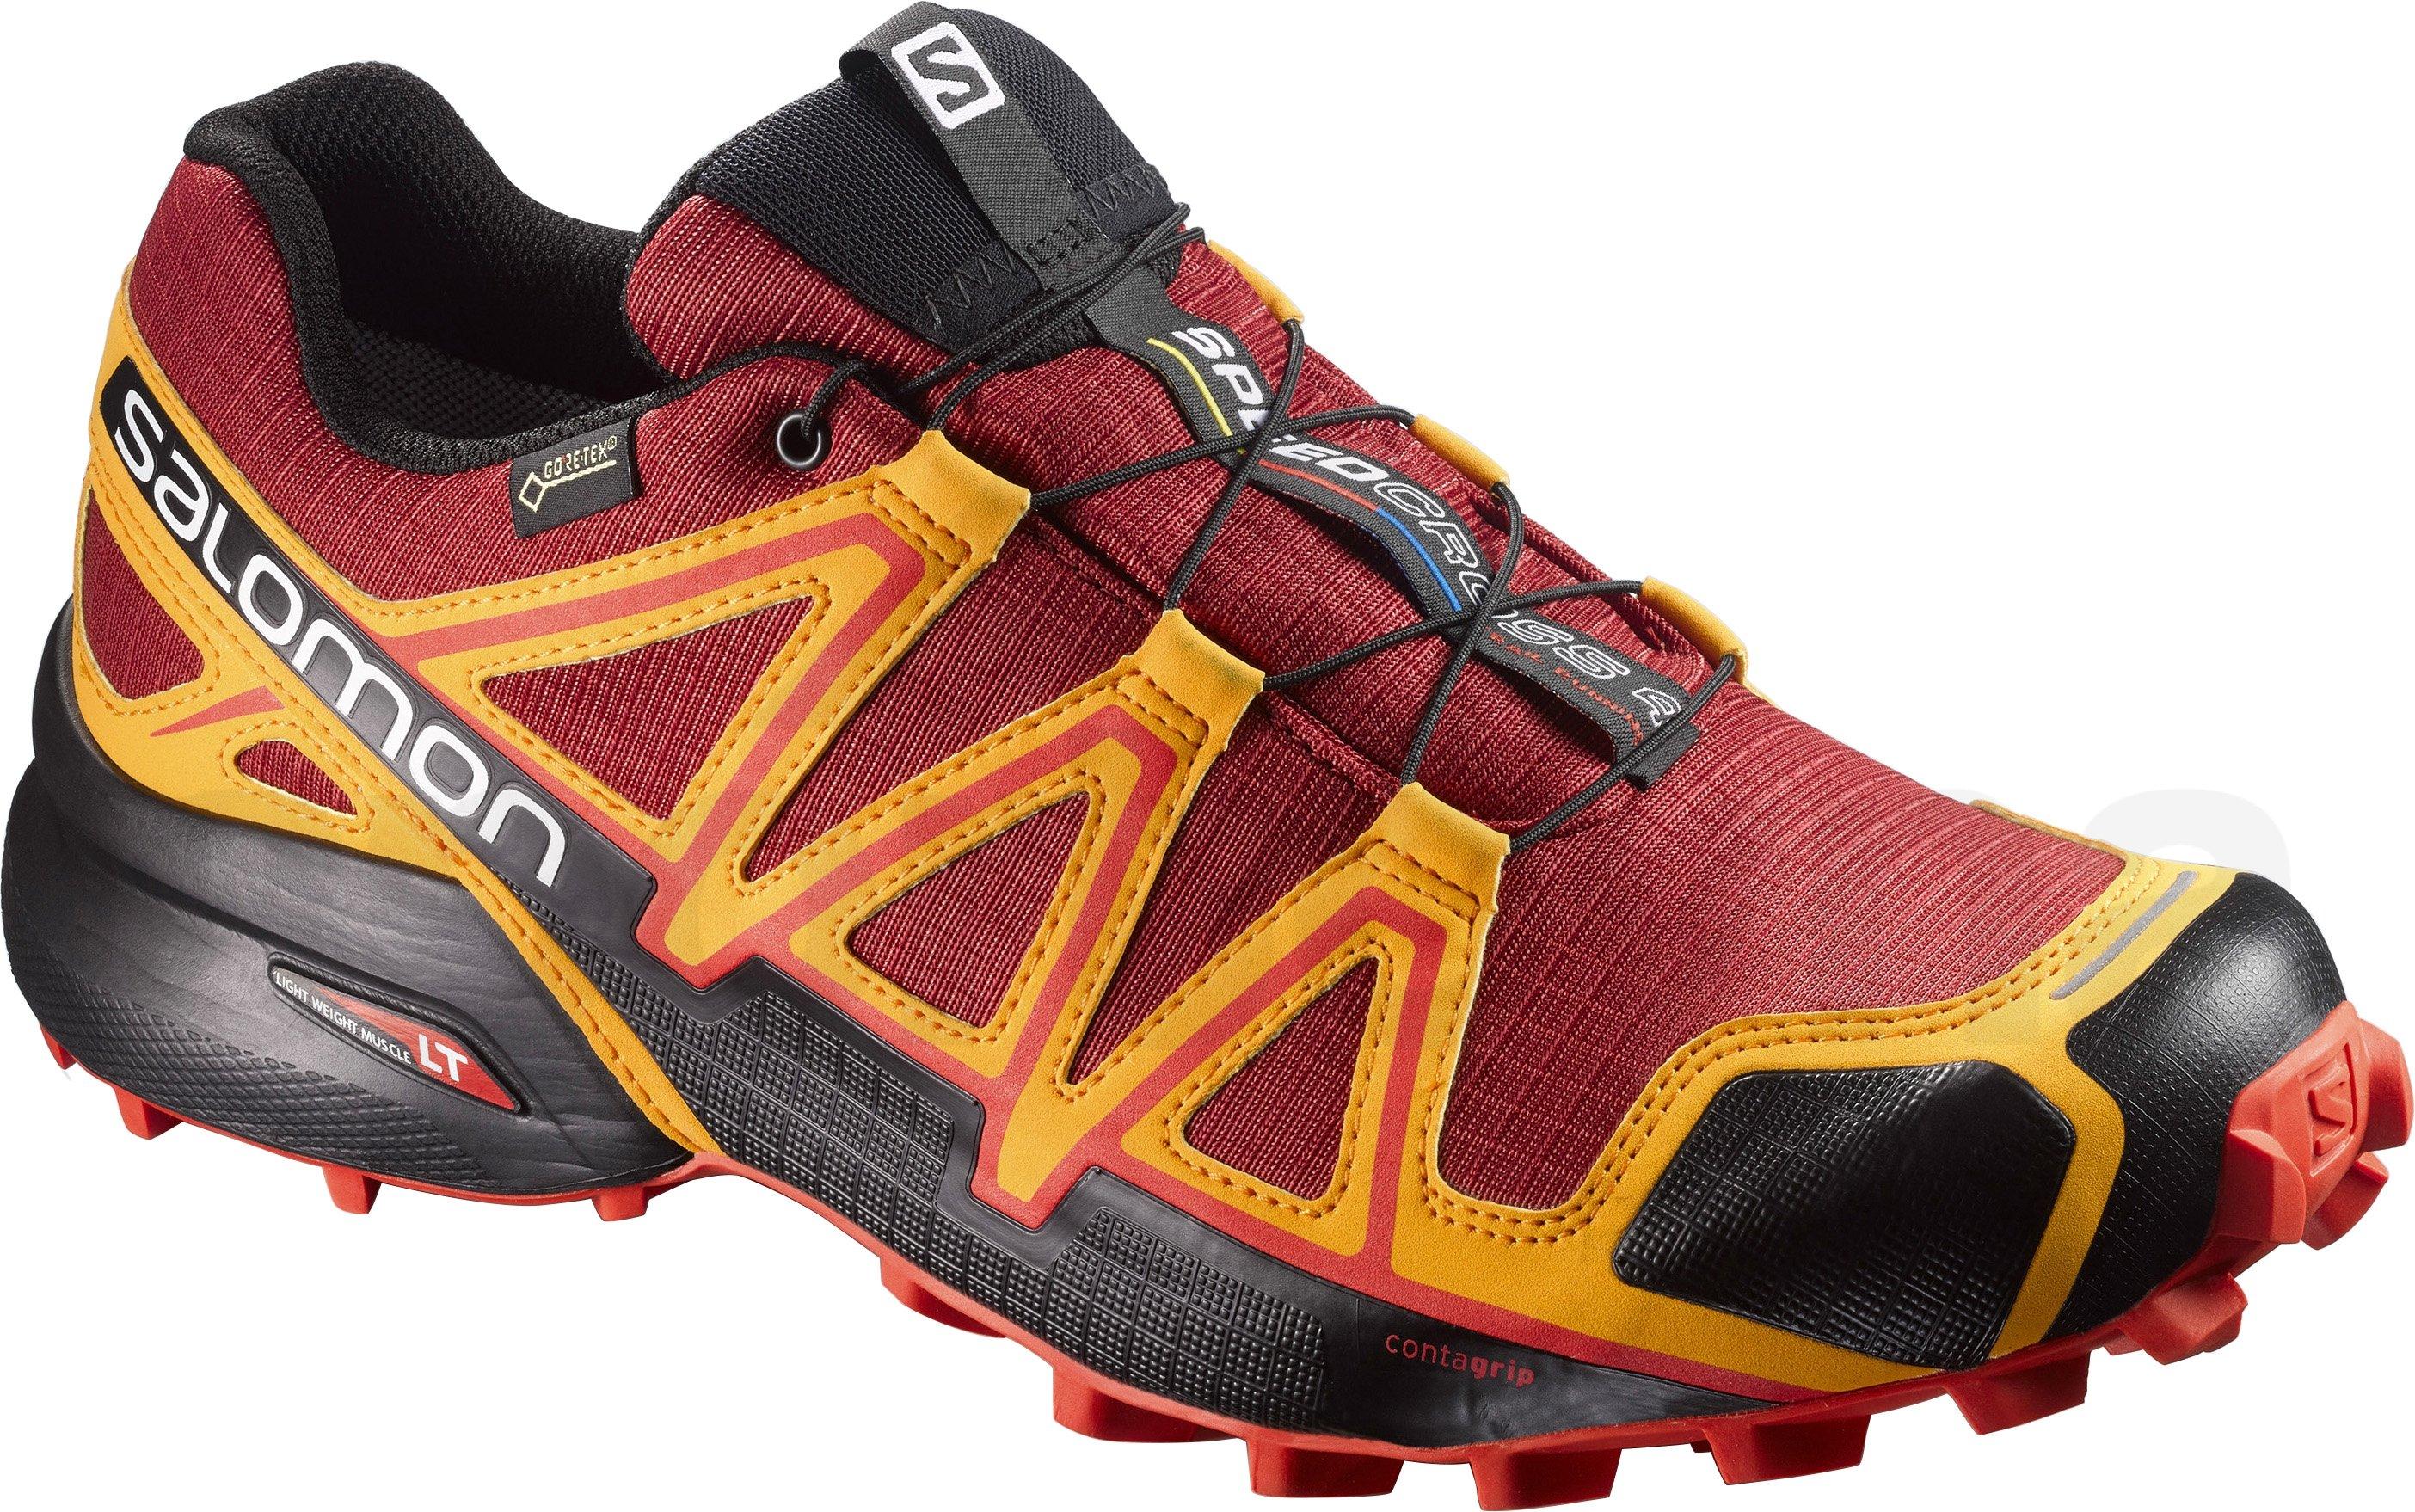 Pánská trailová běžecká obuv Salomon SPEEDCROSS 4 GTX Medieval Blue ... f6d1354aba4